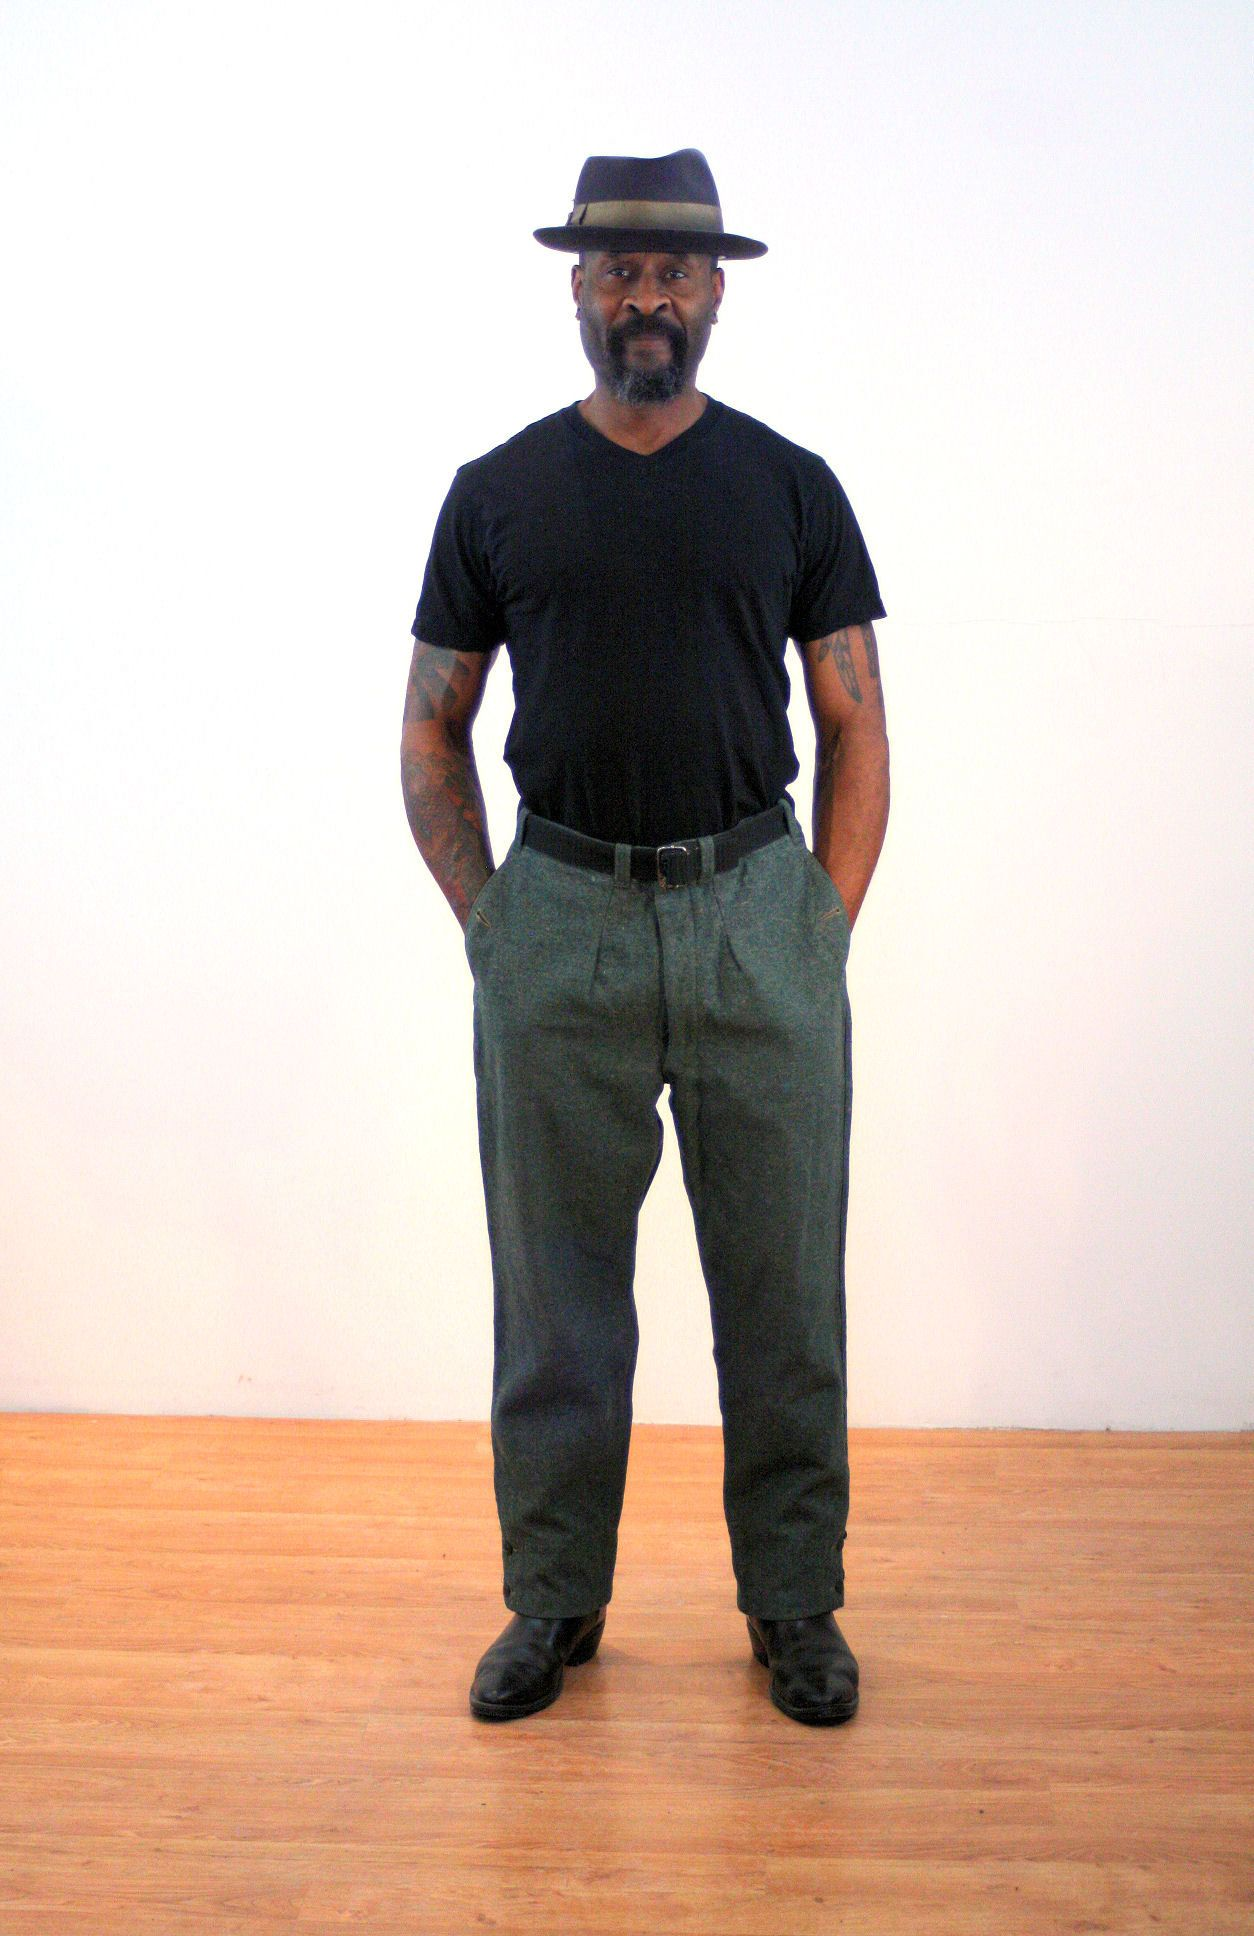 fe67372a0 80s Military Trousers 34 Waist